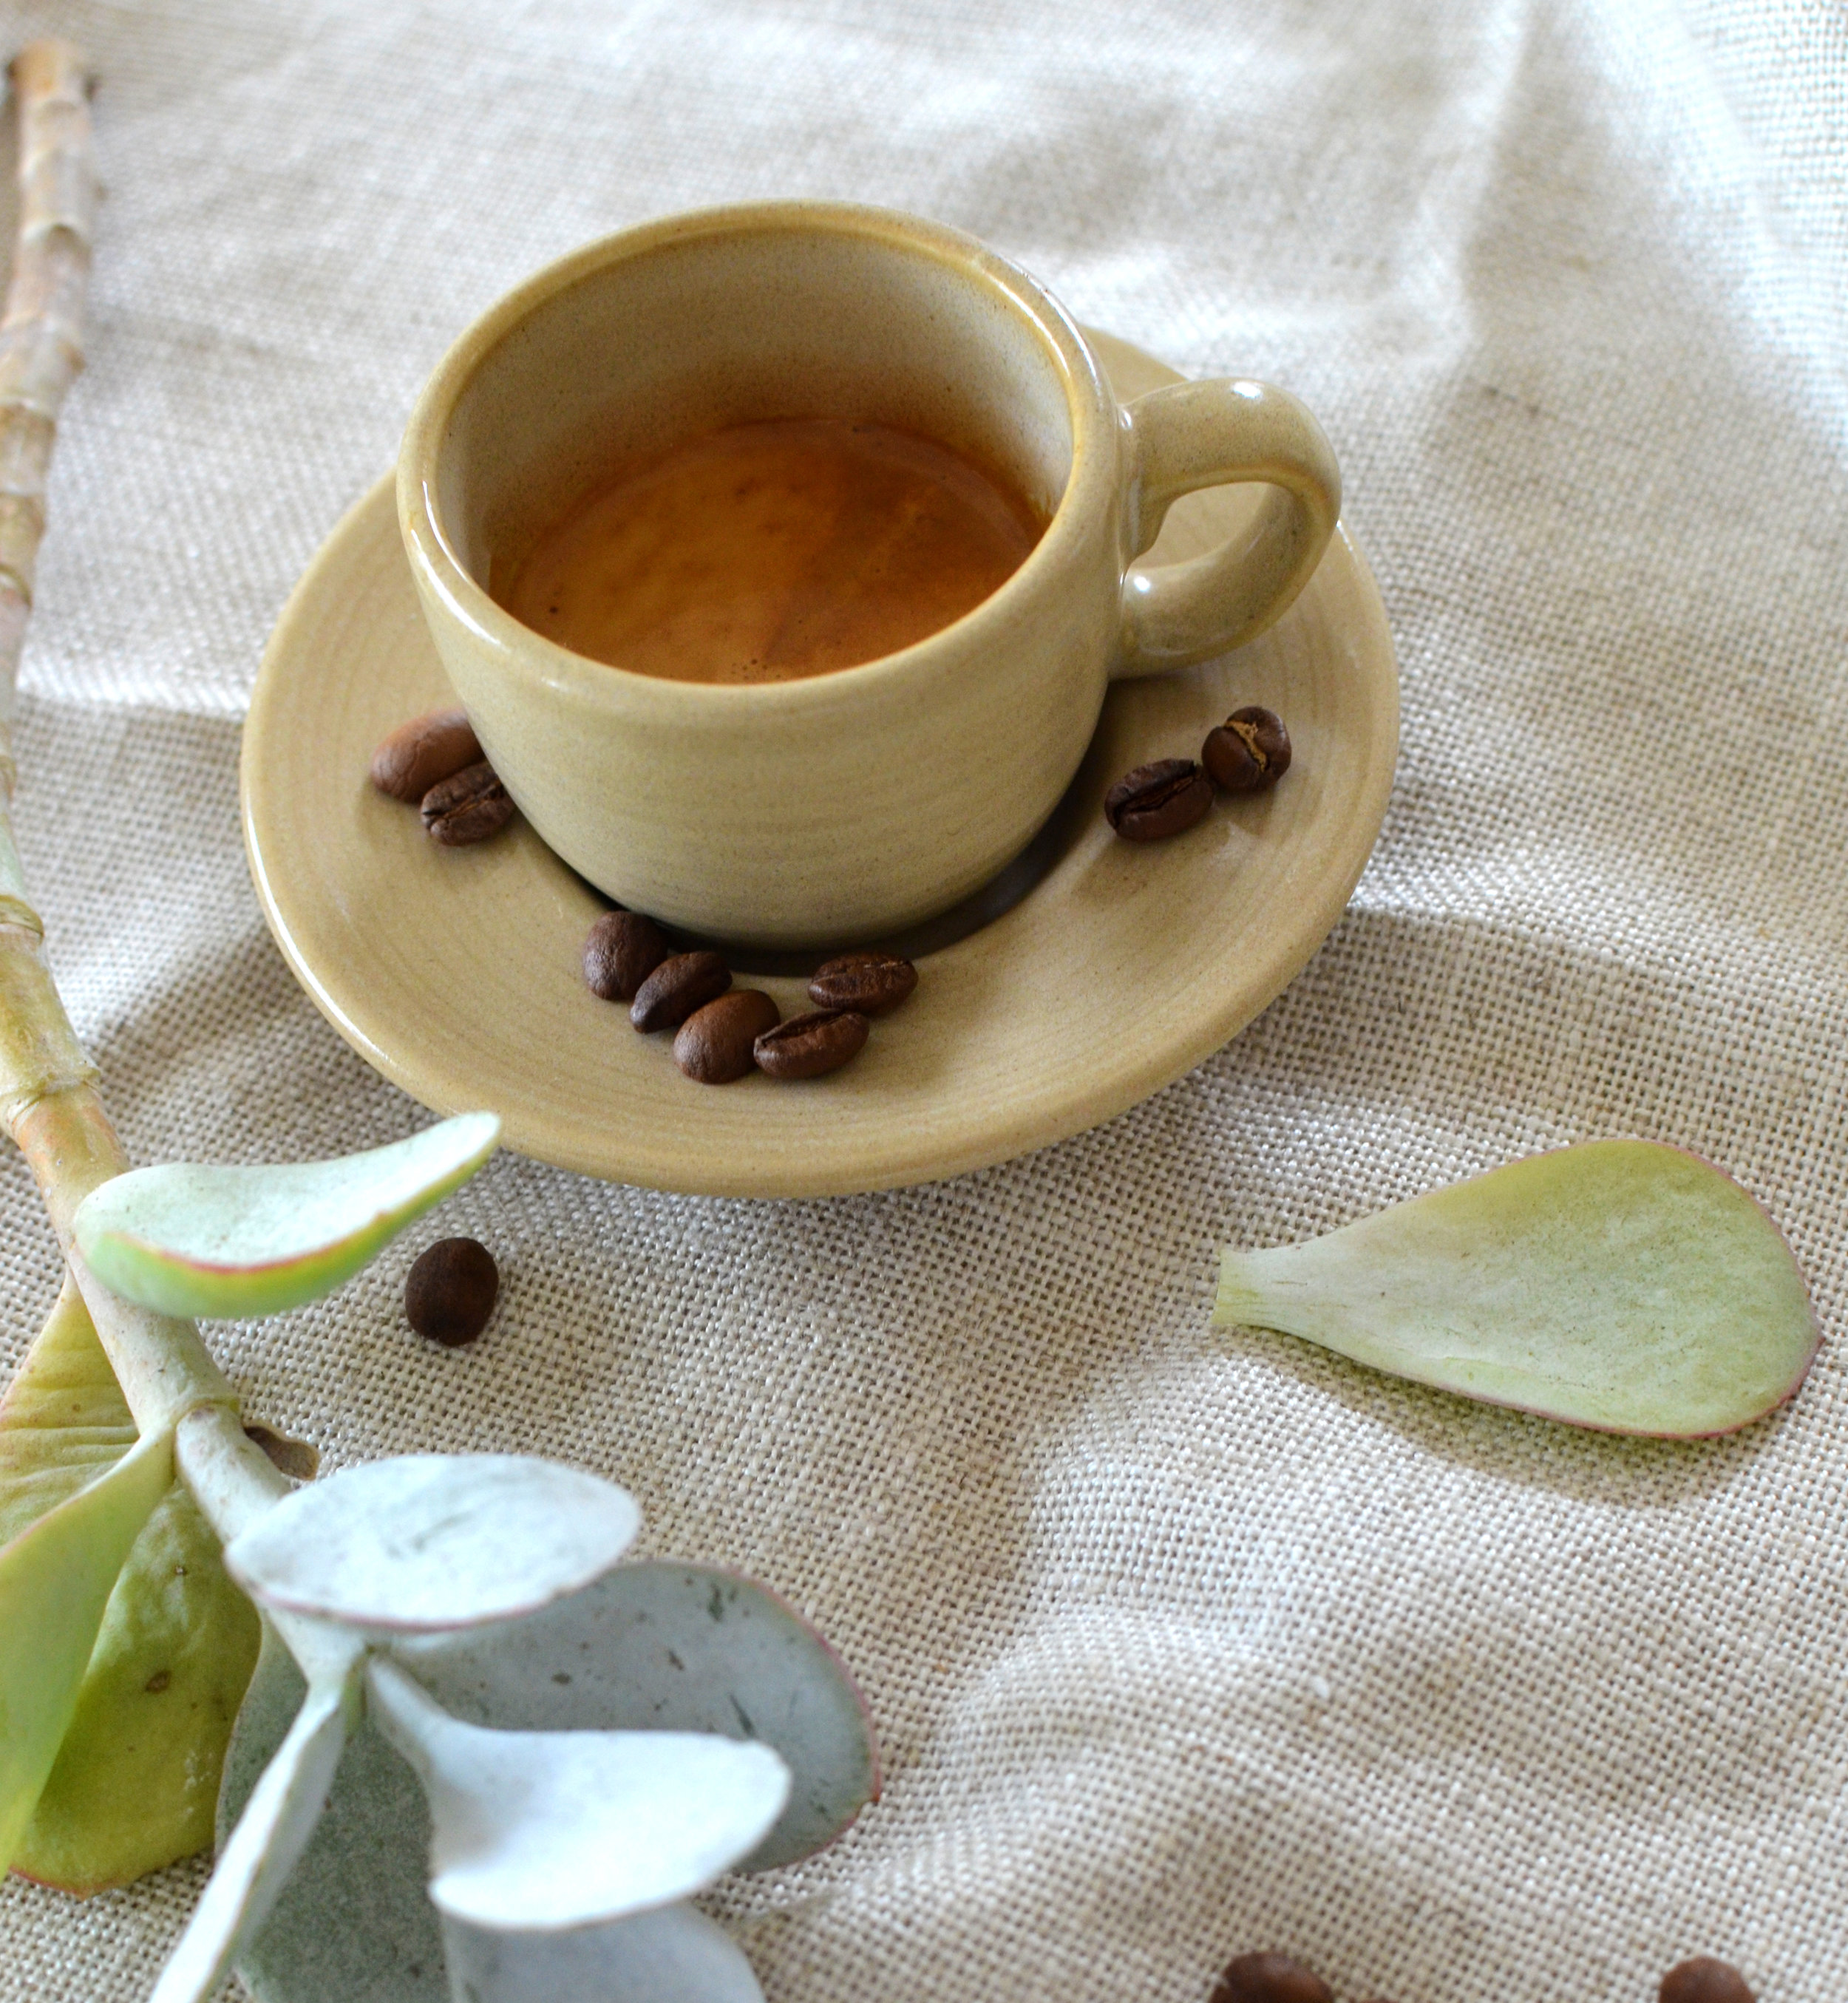 espressosmall.jpg